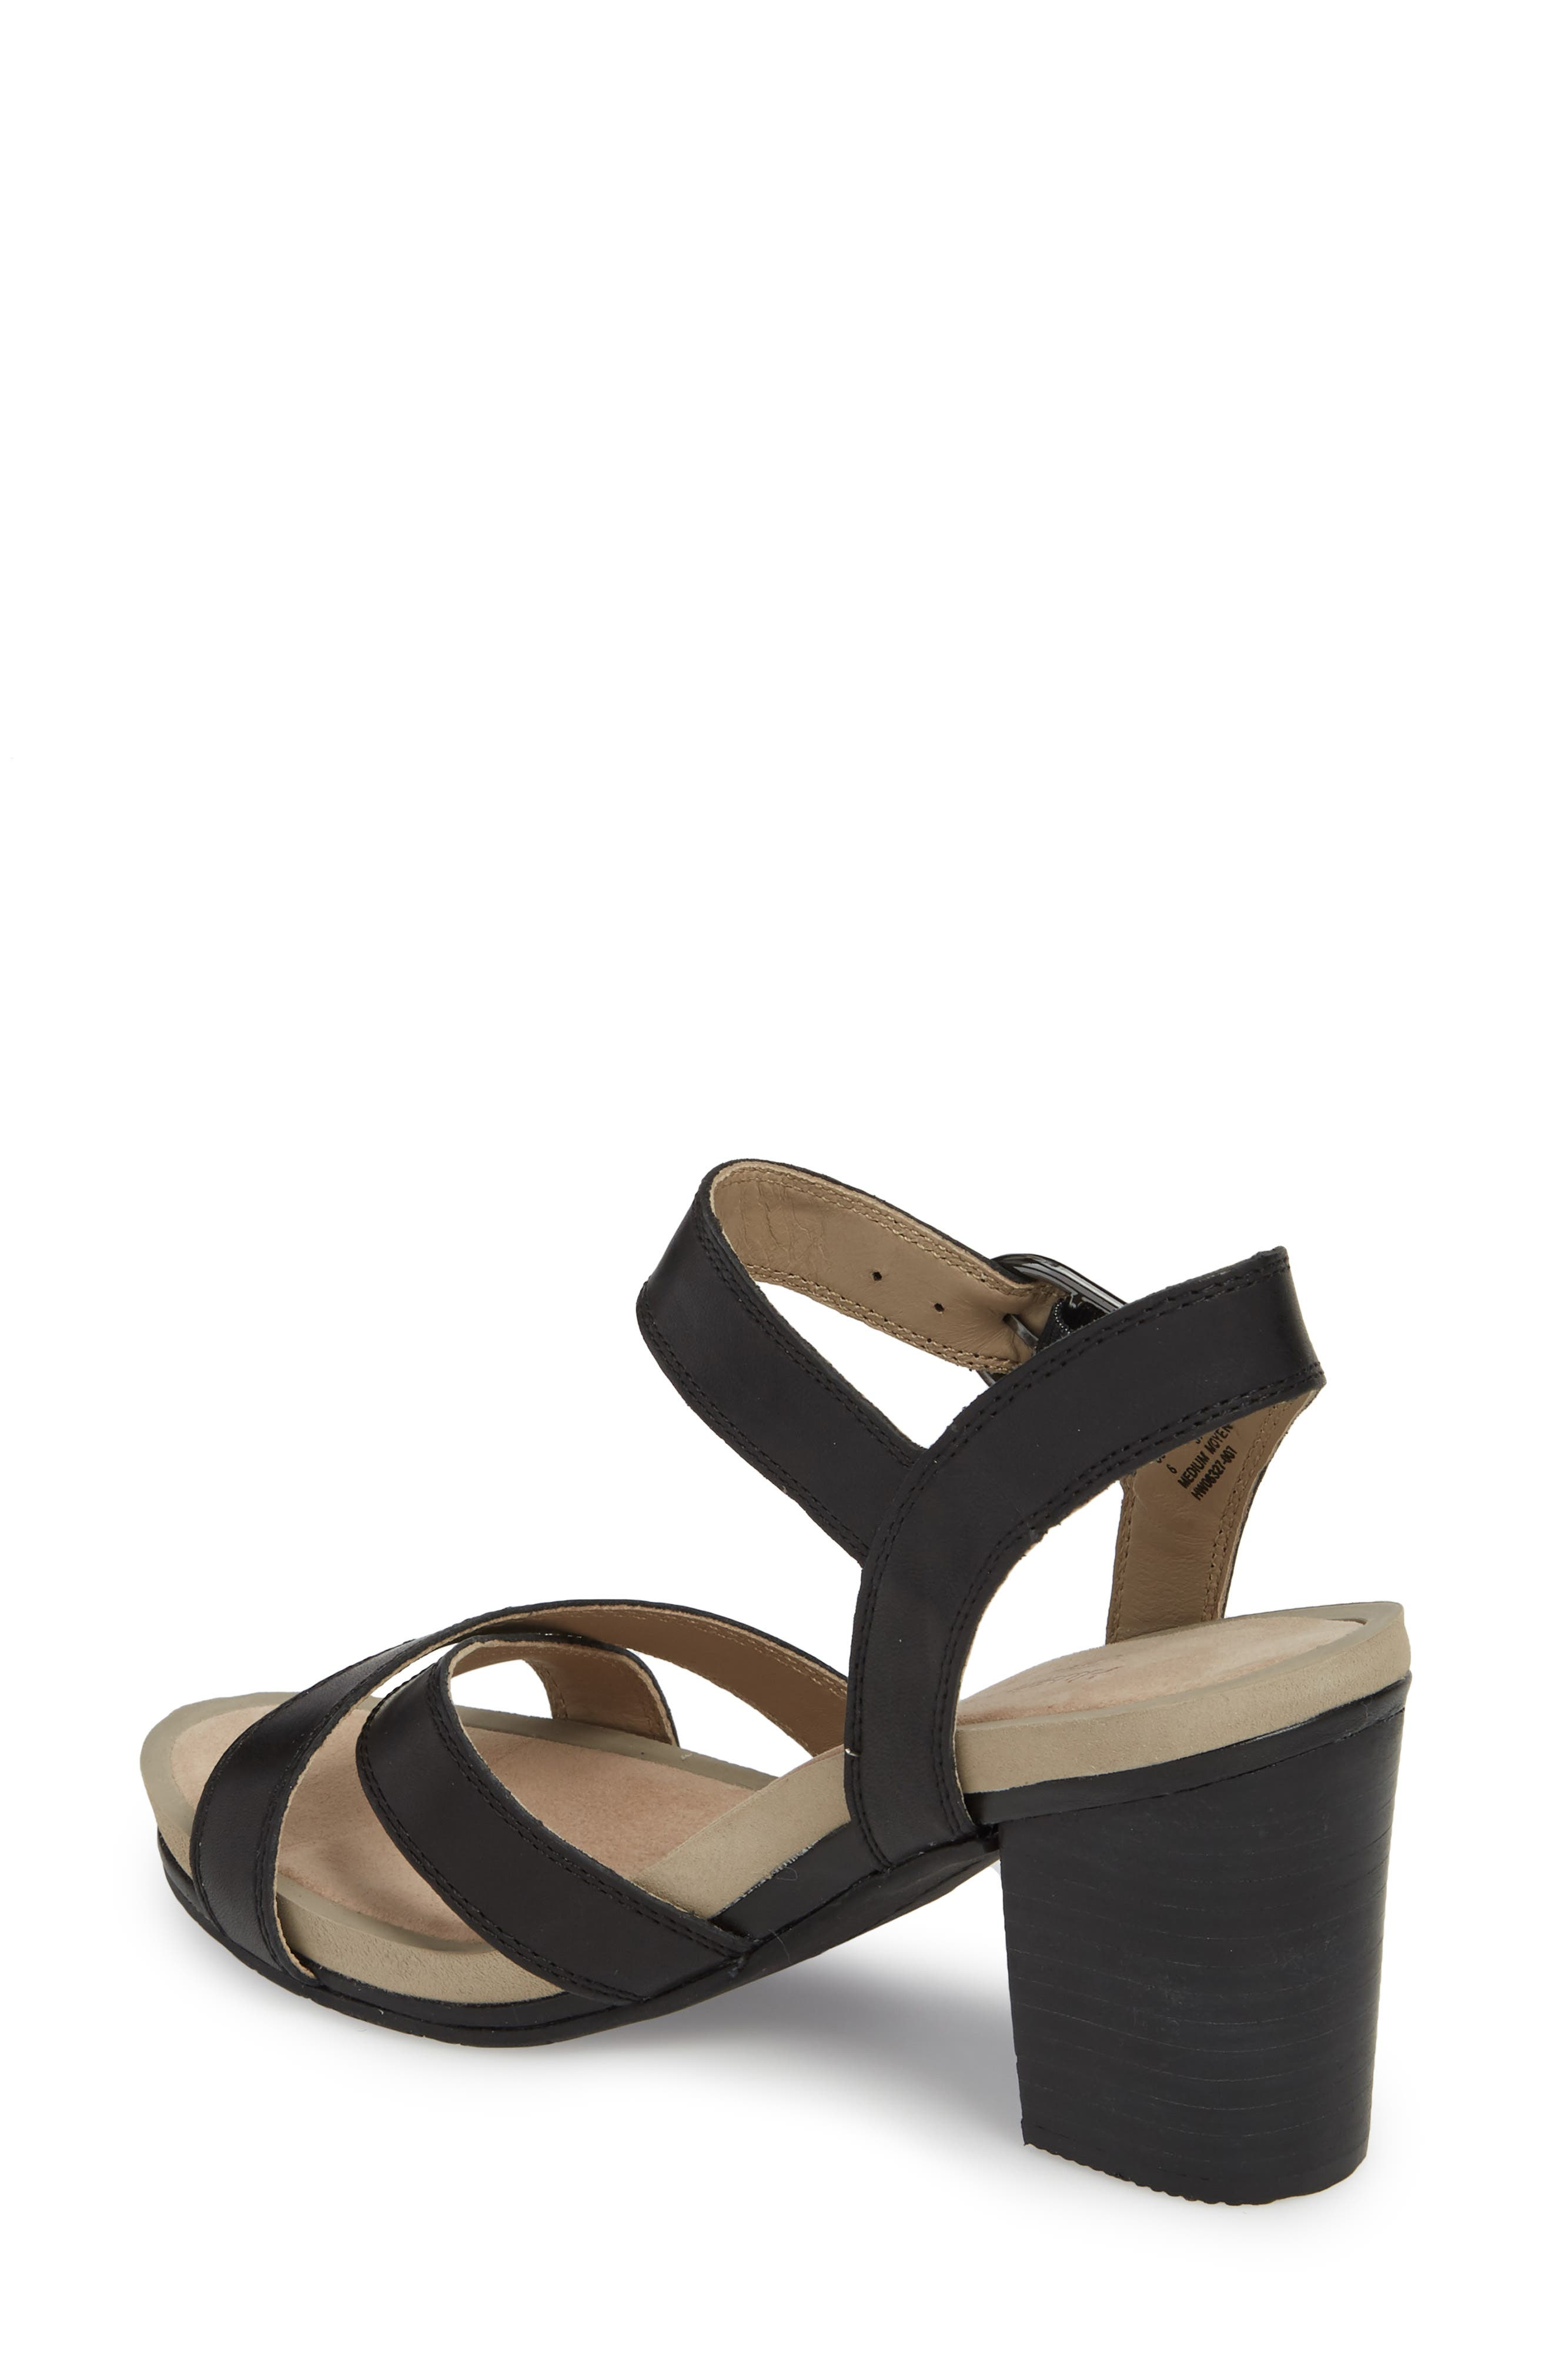 Mariska Block Heel Sandal,                             Alternate thumbnail 2, color,                             Black Leather